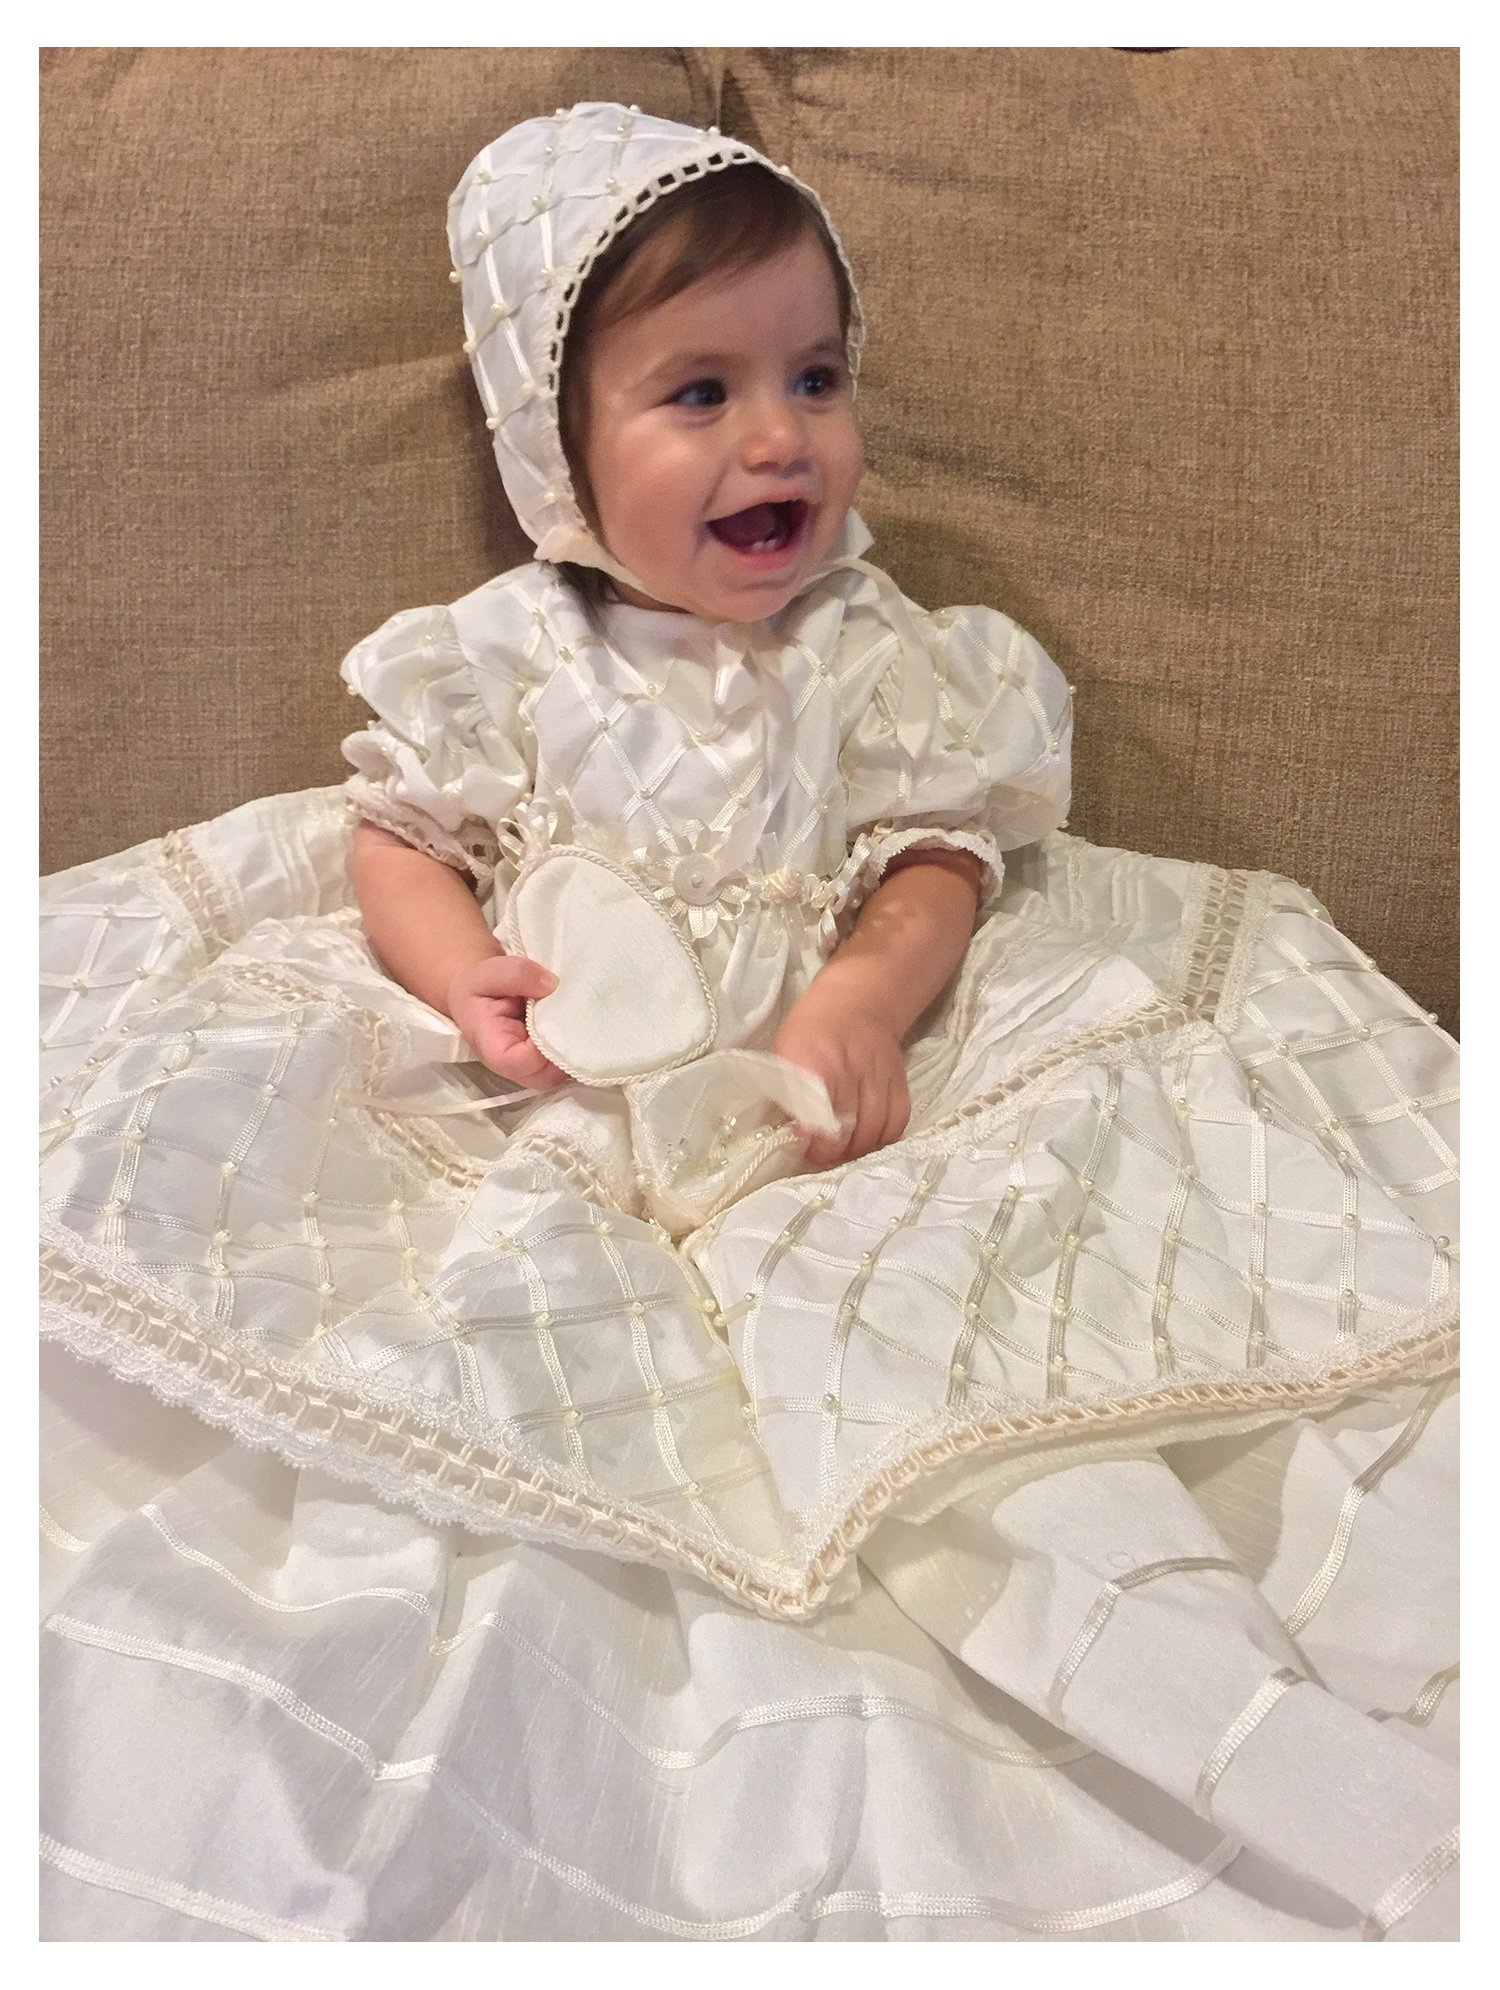 Baby-girls Heirloom Christening Baptism Gown Dress (Burbvus Ropones) Handmade - Silk by Burbvus (Image #2)